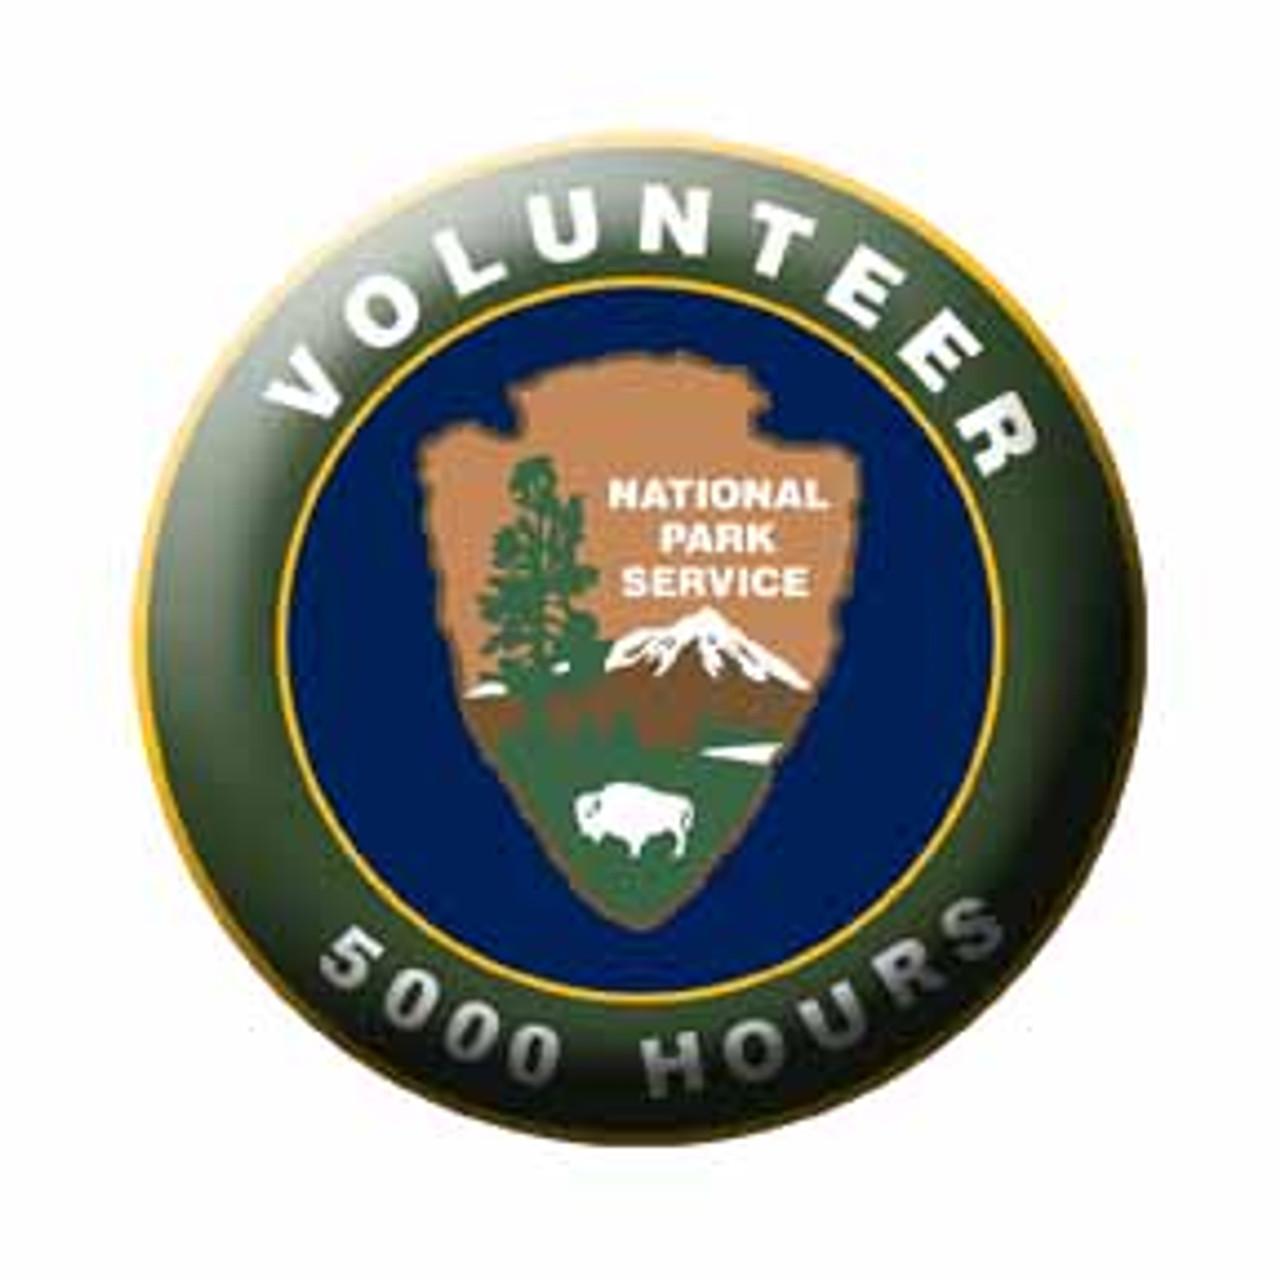 National Park Service Volunteer Hour Pins (4250 hours)